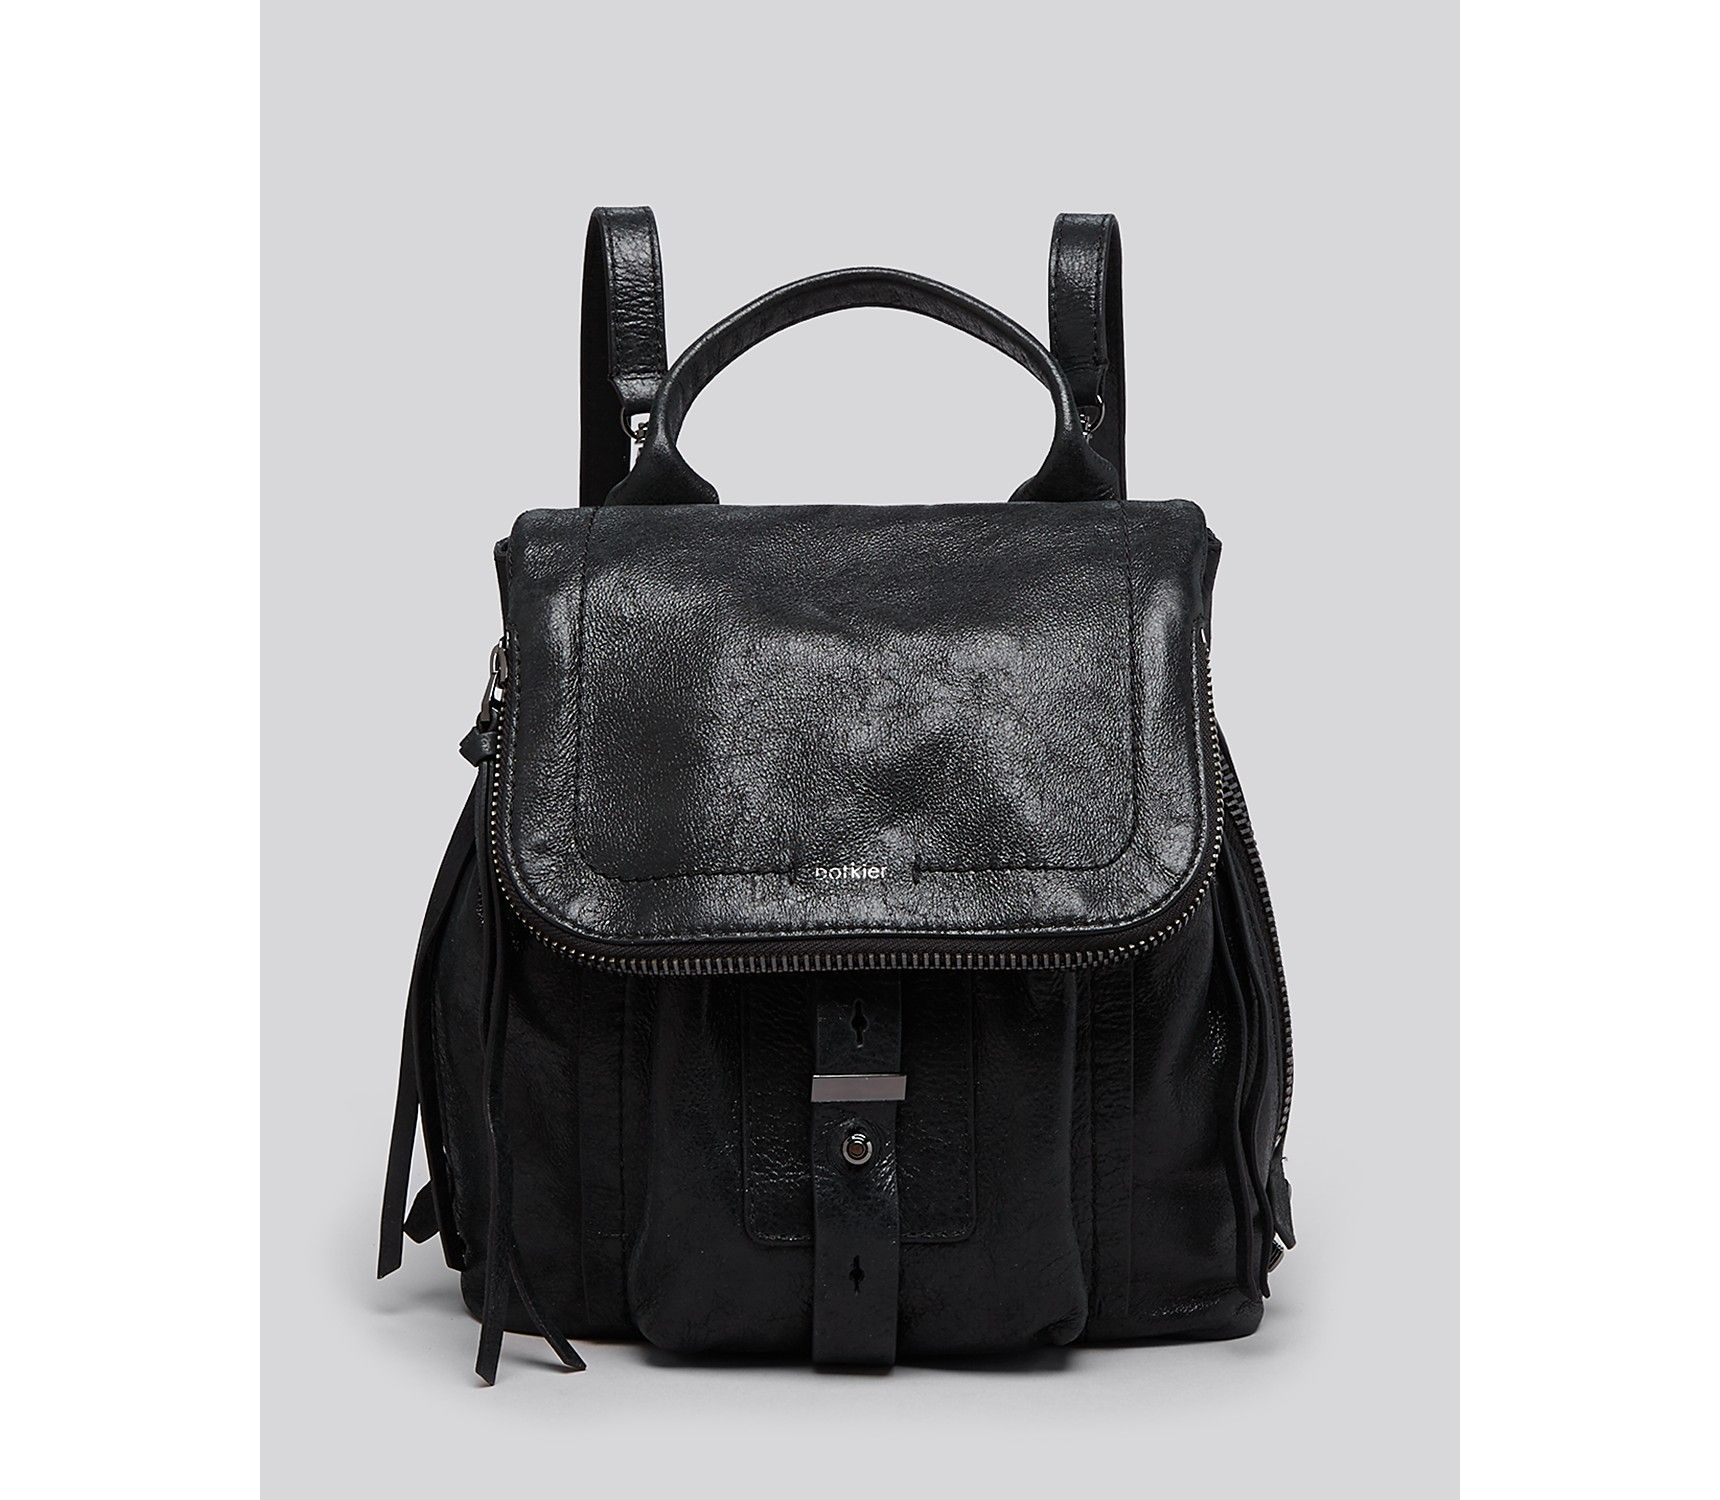 62fb3d735fd6 Botkier Backpack - Warren